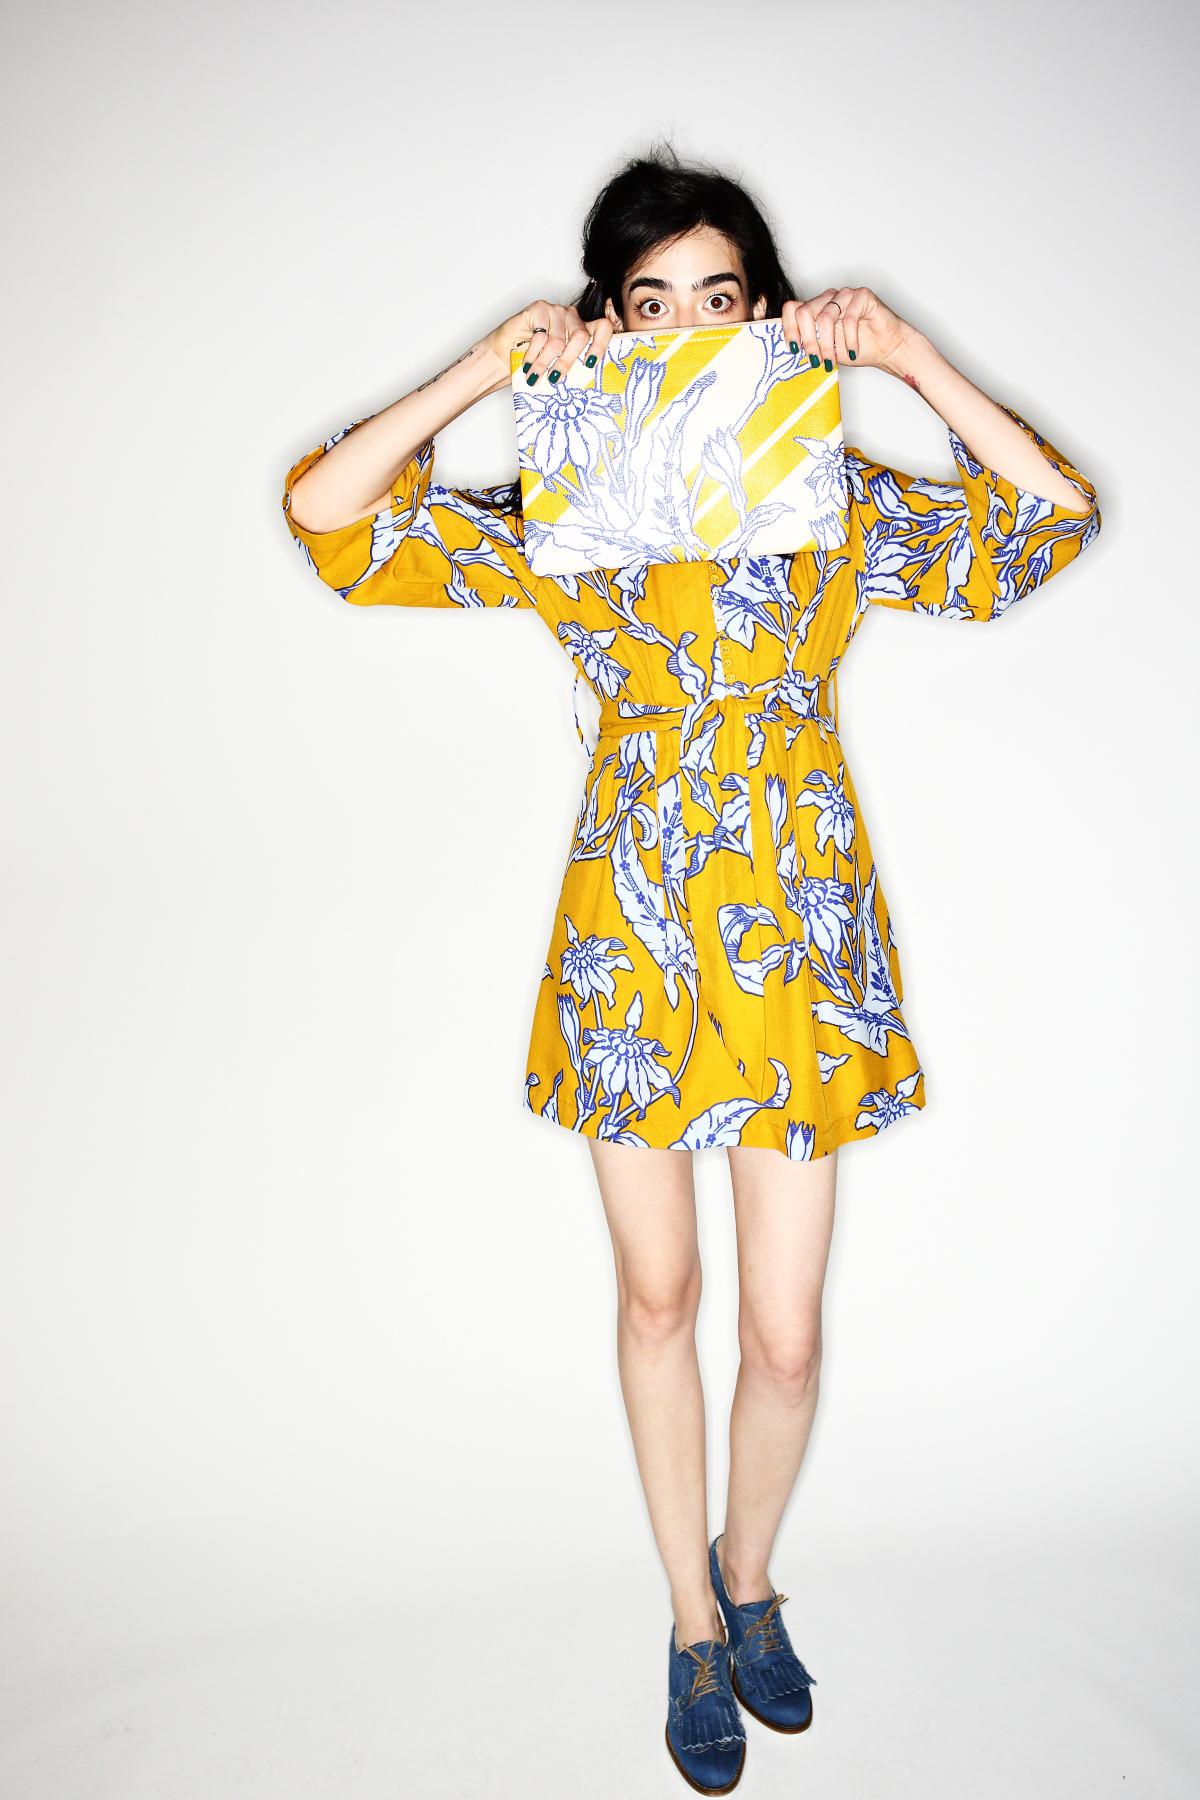 Karen Walker SS15 Fashion Show New York Backstage